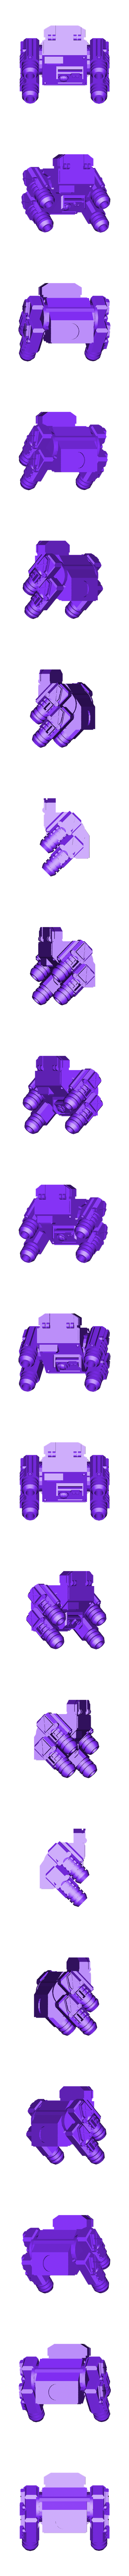 Wyvern_Single_Model.stl Download free STL file Interstellar Army - Quad Mortar and Quad Cannon • 3D printing model, Cikkirock